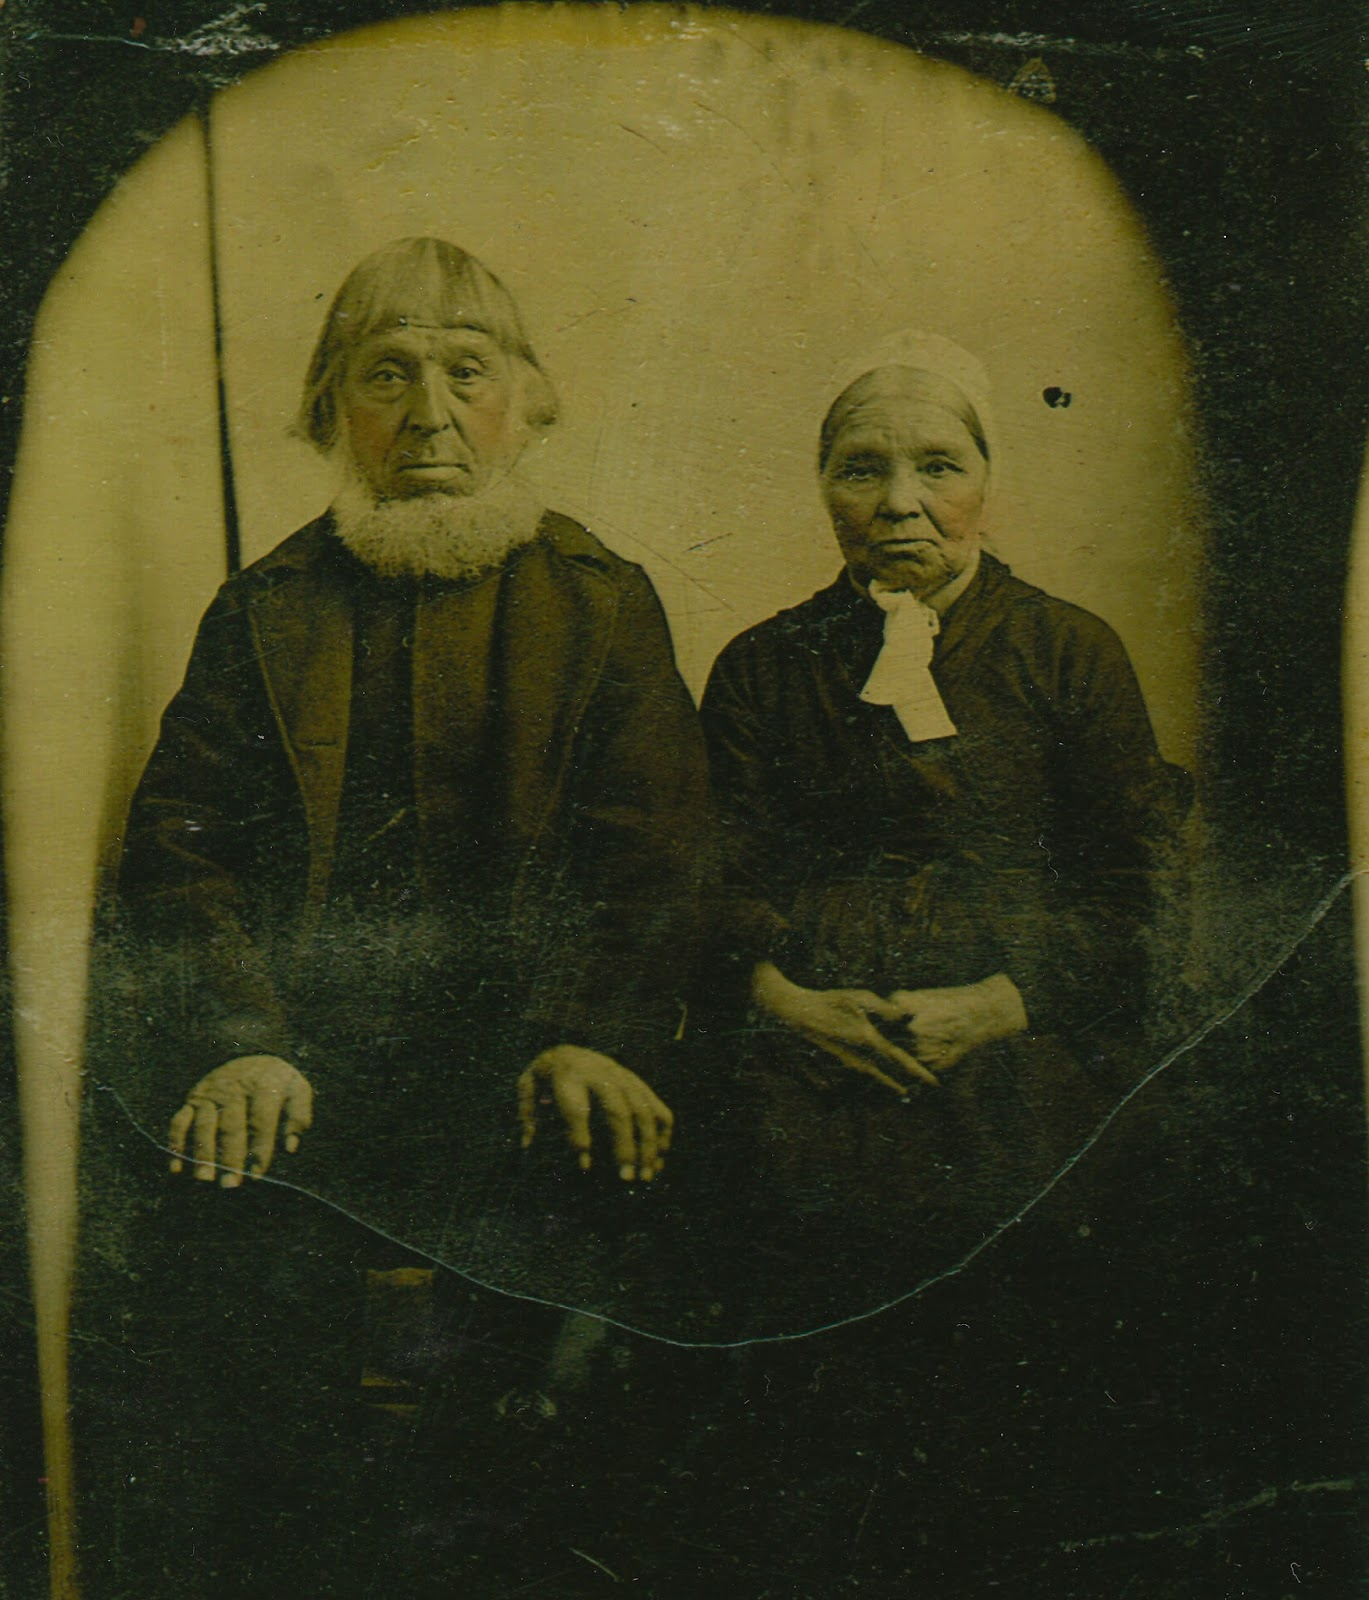 Amish People 1700s Pennsylvania